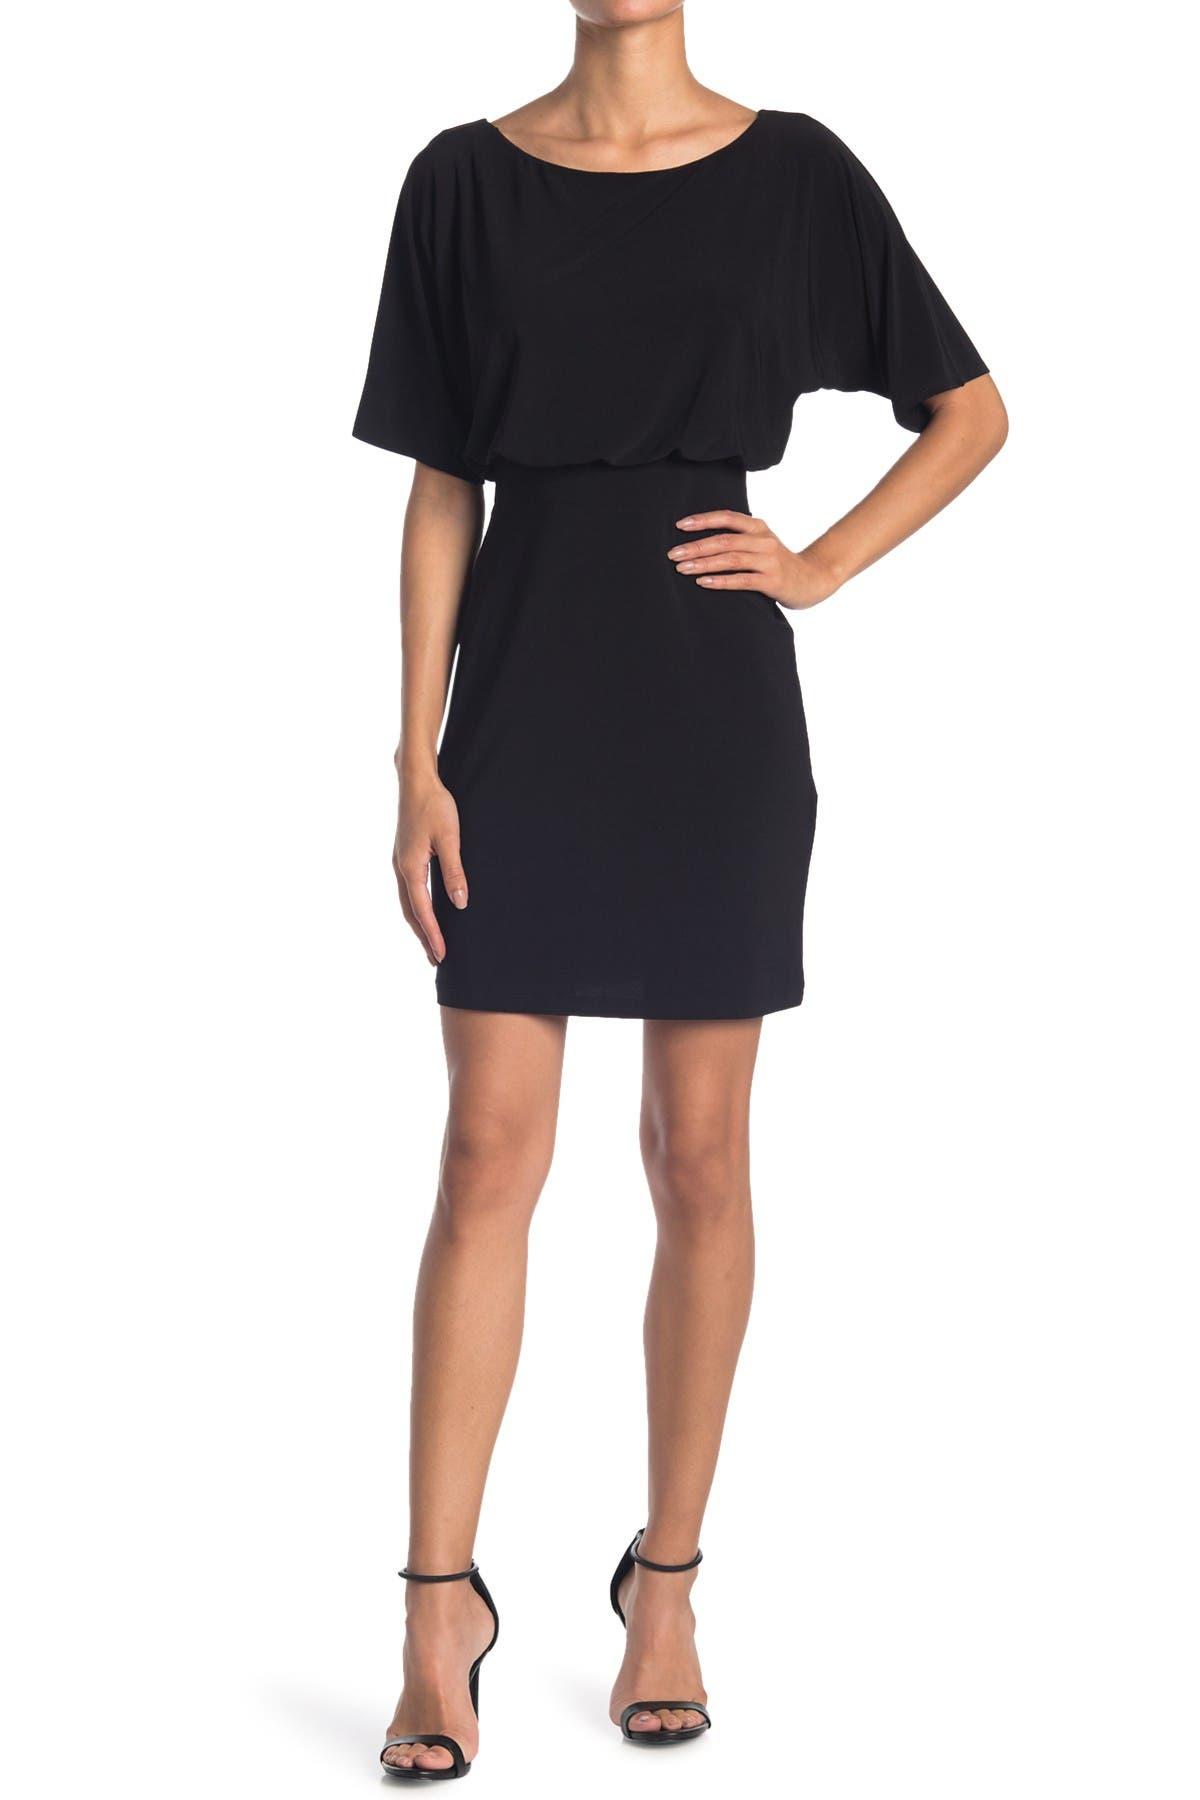 Image of TASH + SOPHIE Dolman Sleeve Jersey Sheath Dress